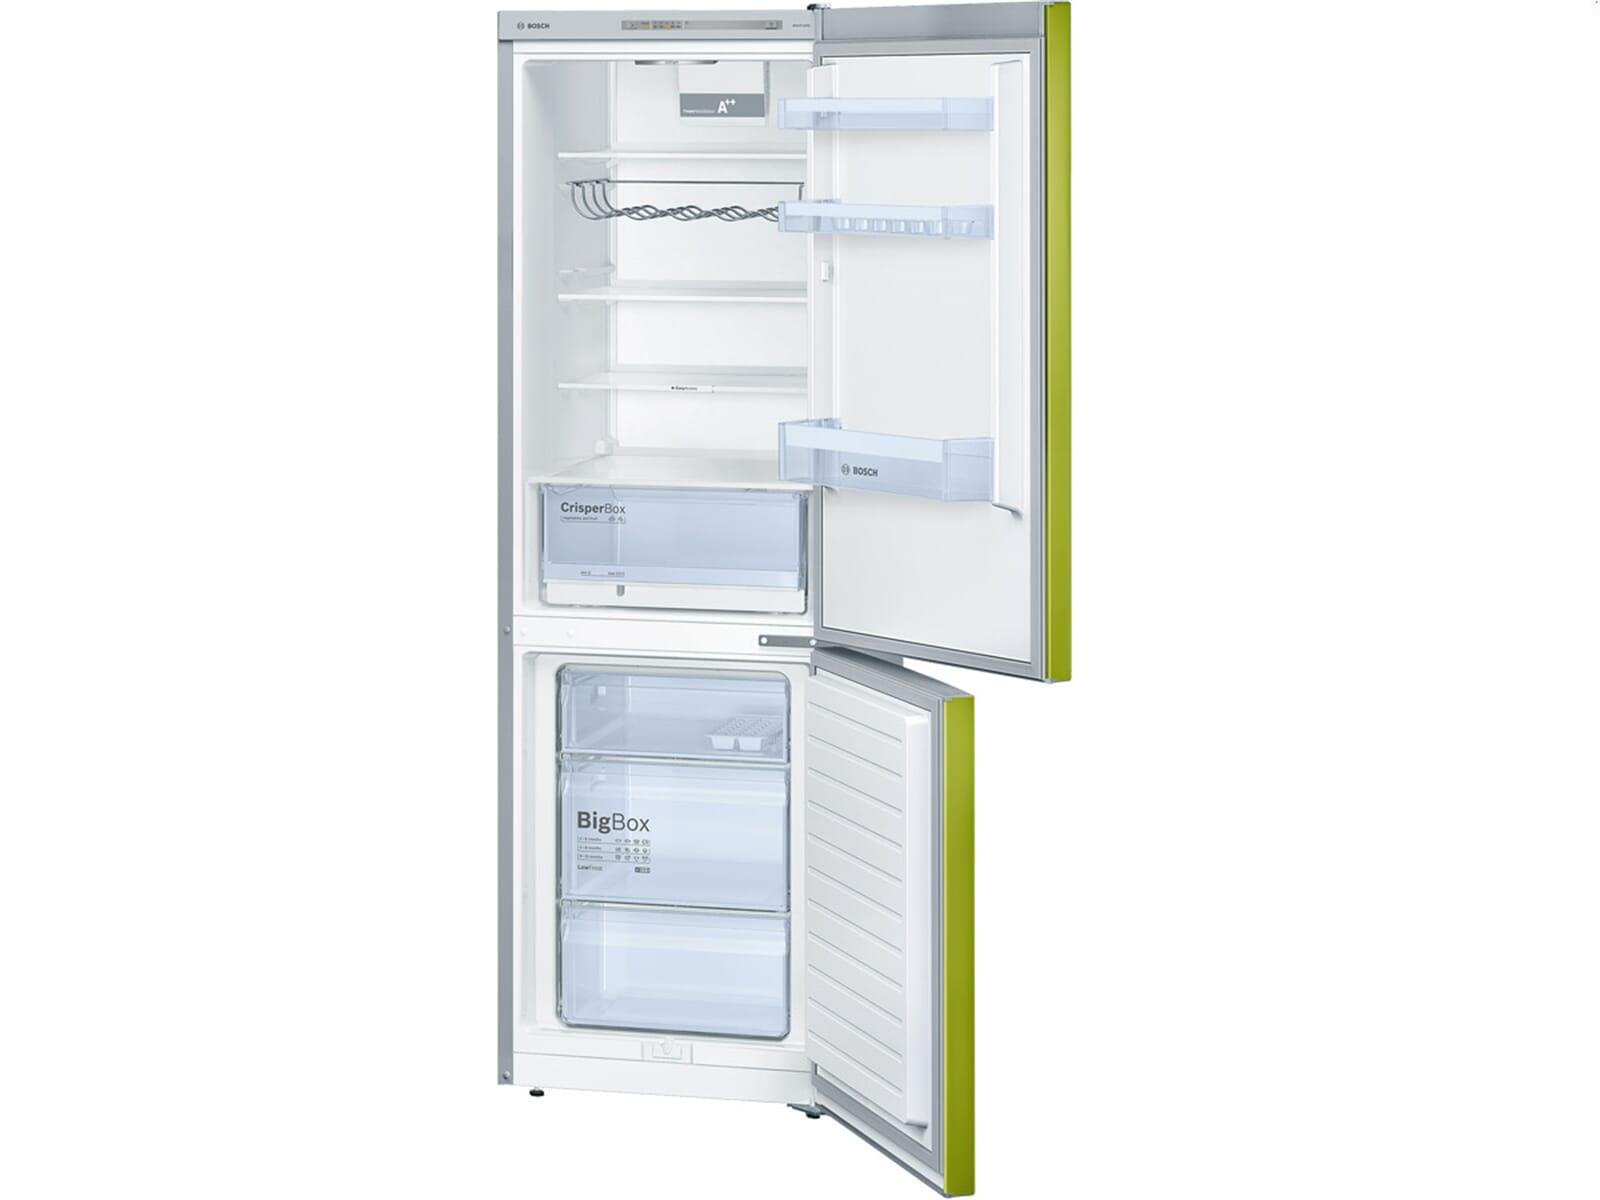 Bosch Kühlschrank Kgn 39 Xi 41 : Bosch kgv vh s kühl gefrierkombination lime green ebay